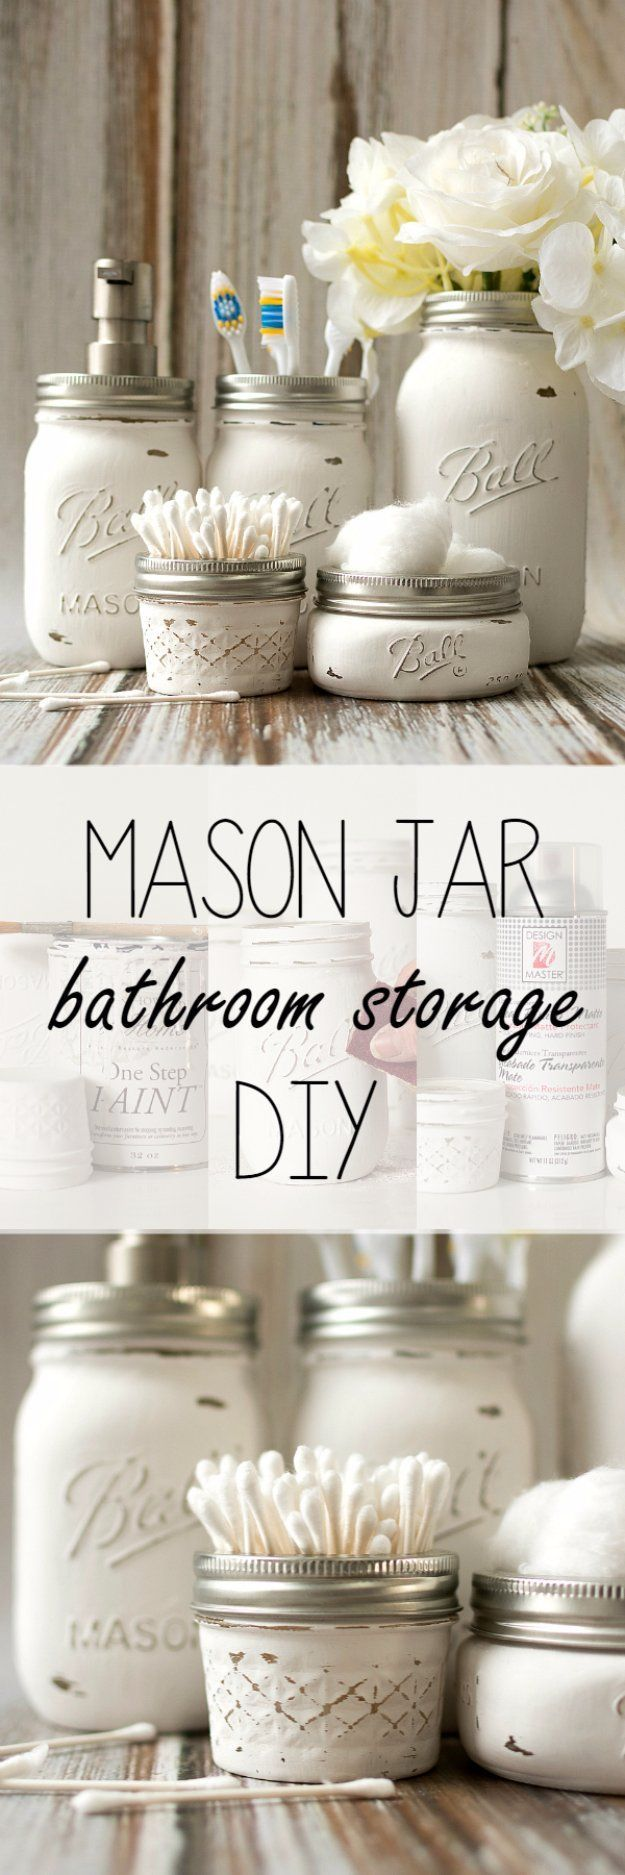 Rustic bathroom ideas pinterest - 31 Brilliant Diy Decor Ideas For Your Bathroom